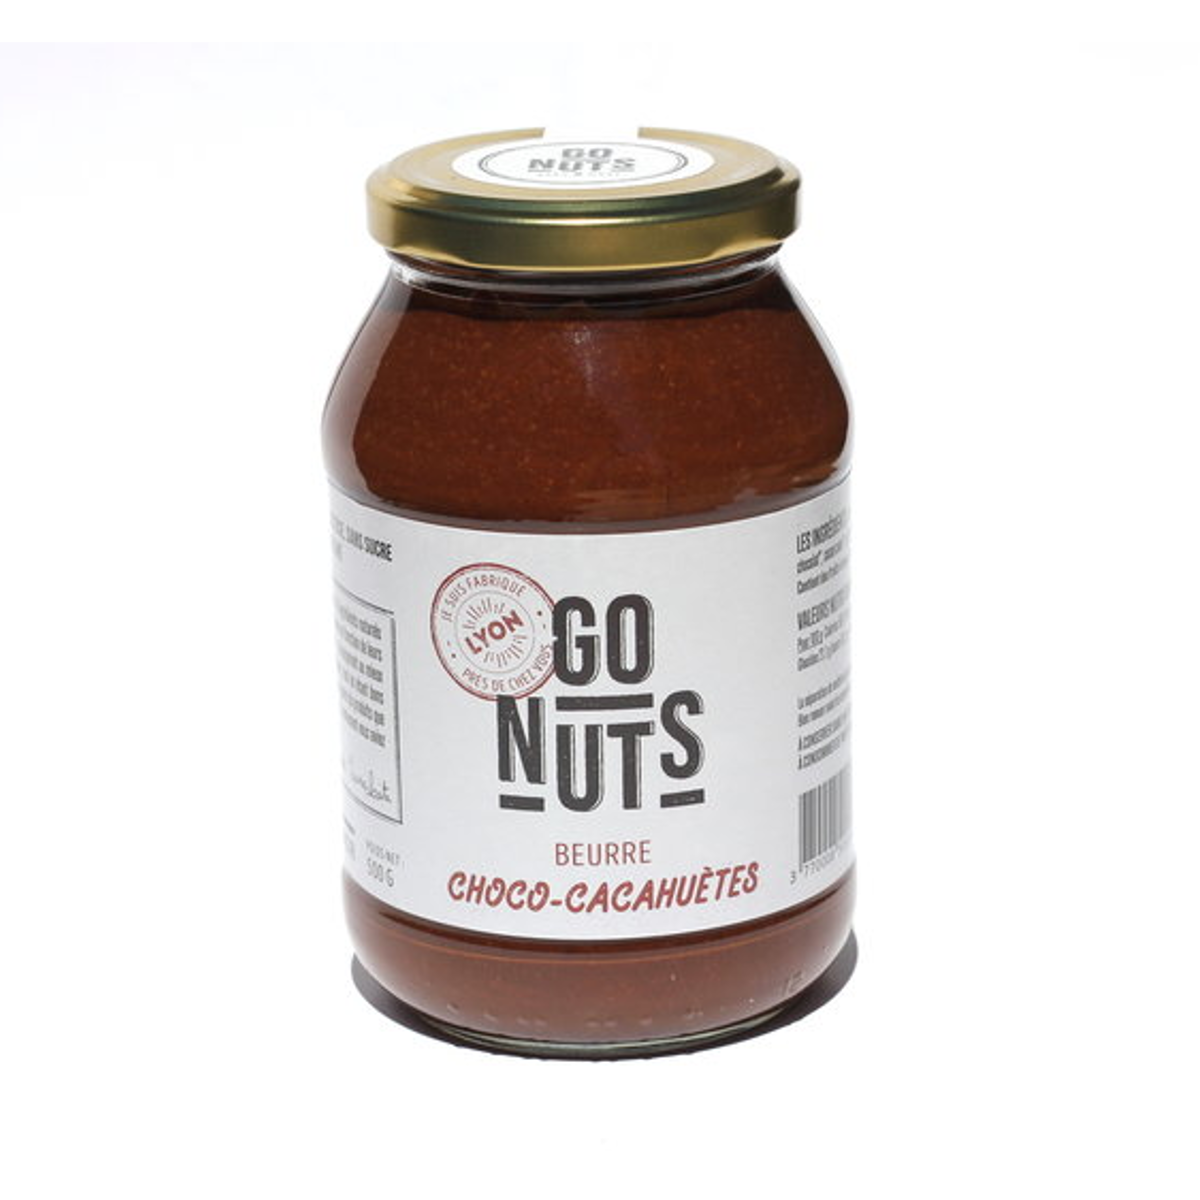 beurre choco cacahu tes bio 500 g go nuts. Black Bedroom Furniture Sets. Home Design Ideas